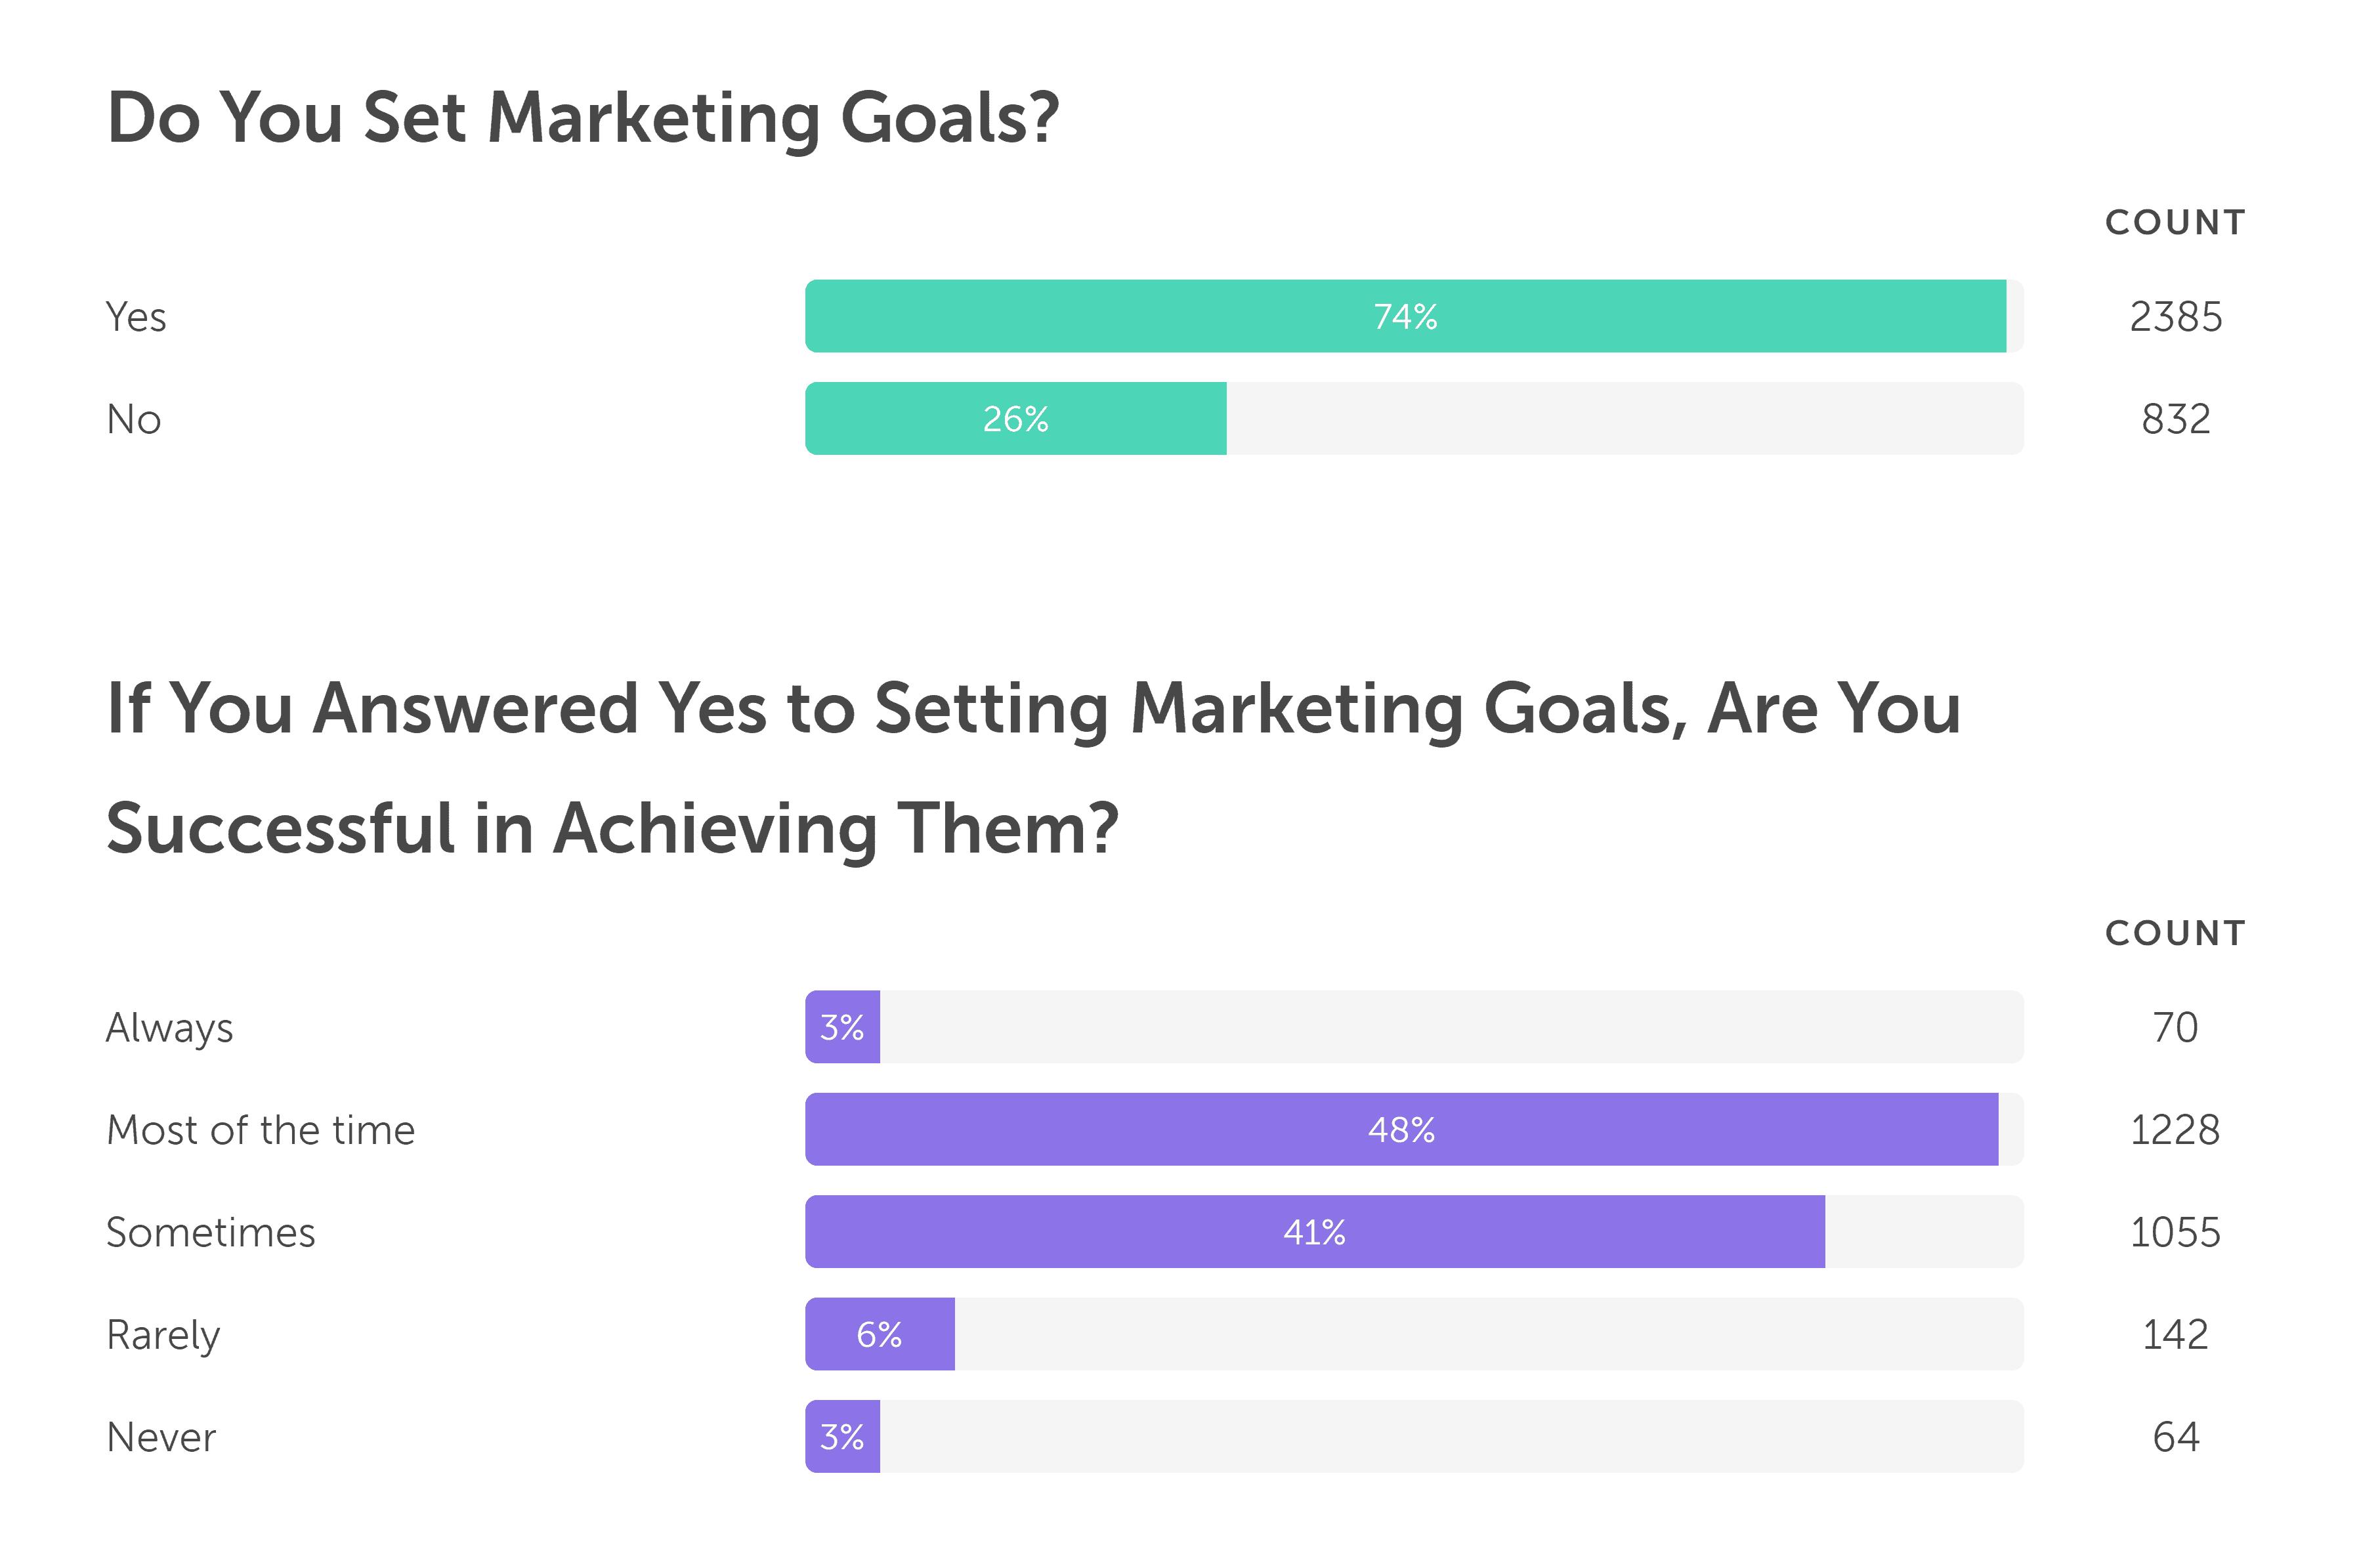 Statistics on setting marketing goals